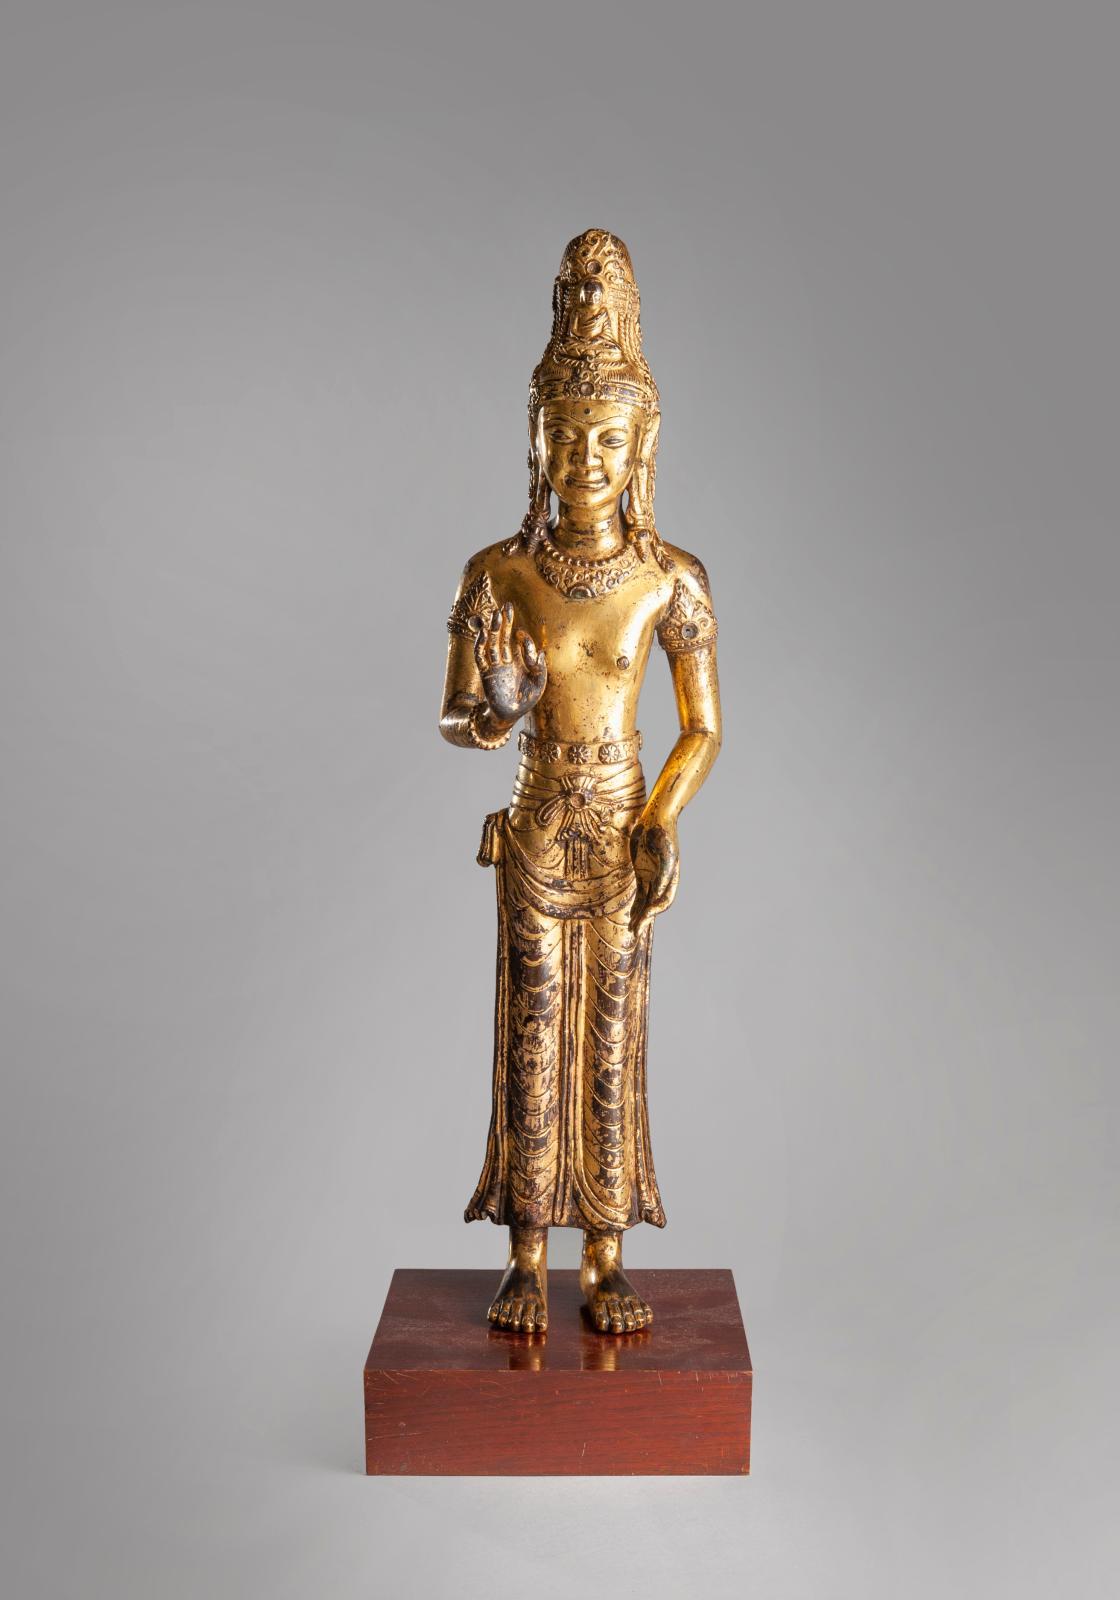 €762,500 Kingdom of Dali, 12th century, rare Acuoye Guanyin statue in gilt bronze, 45.5 x 11 x 6.5 cm.Paris, Drouot, 12 December, Paris Enchères-Colli